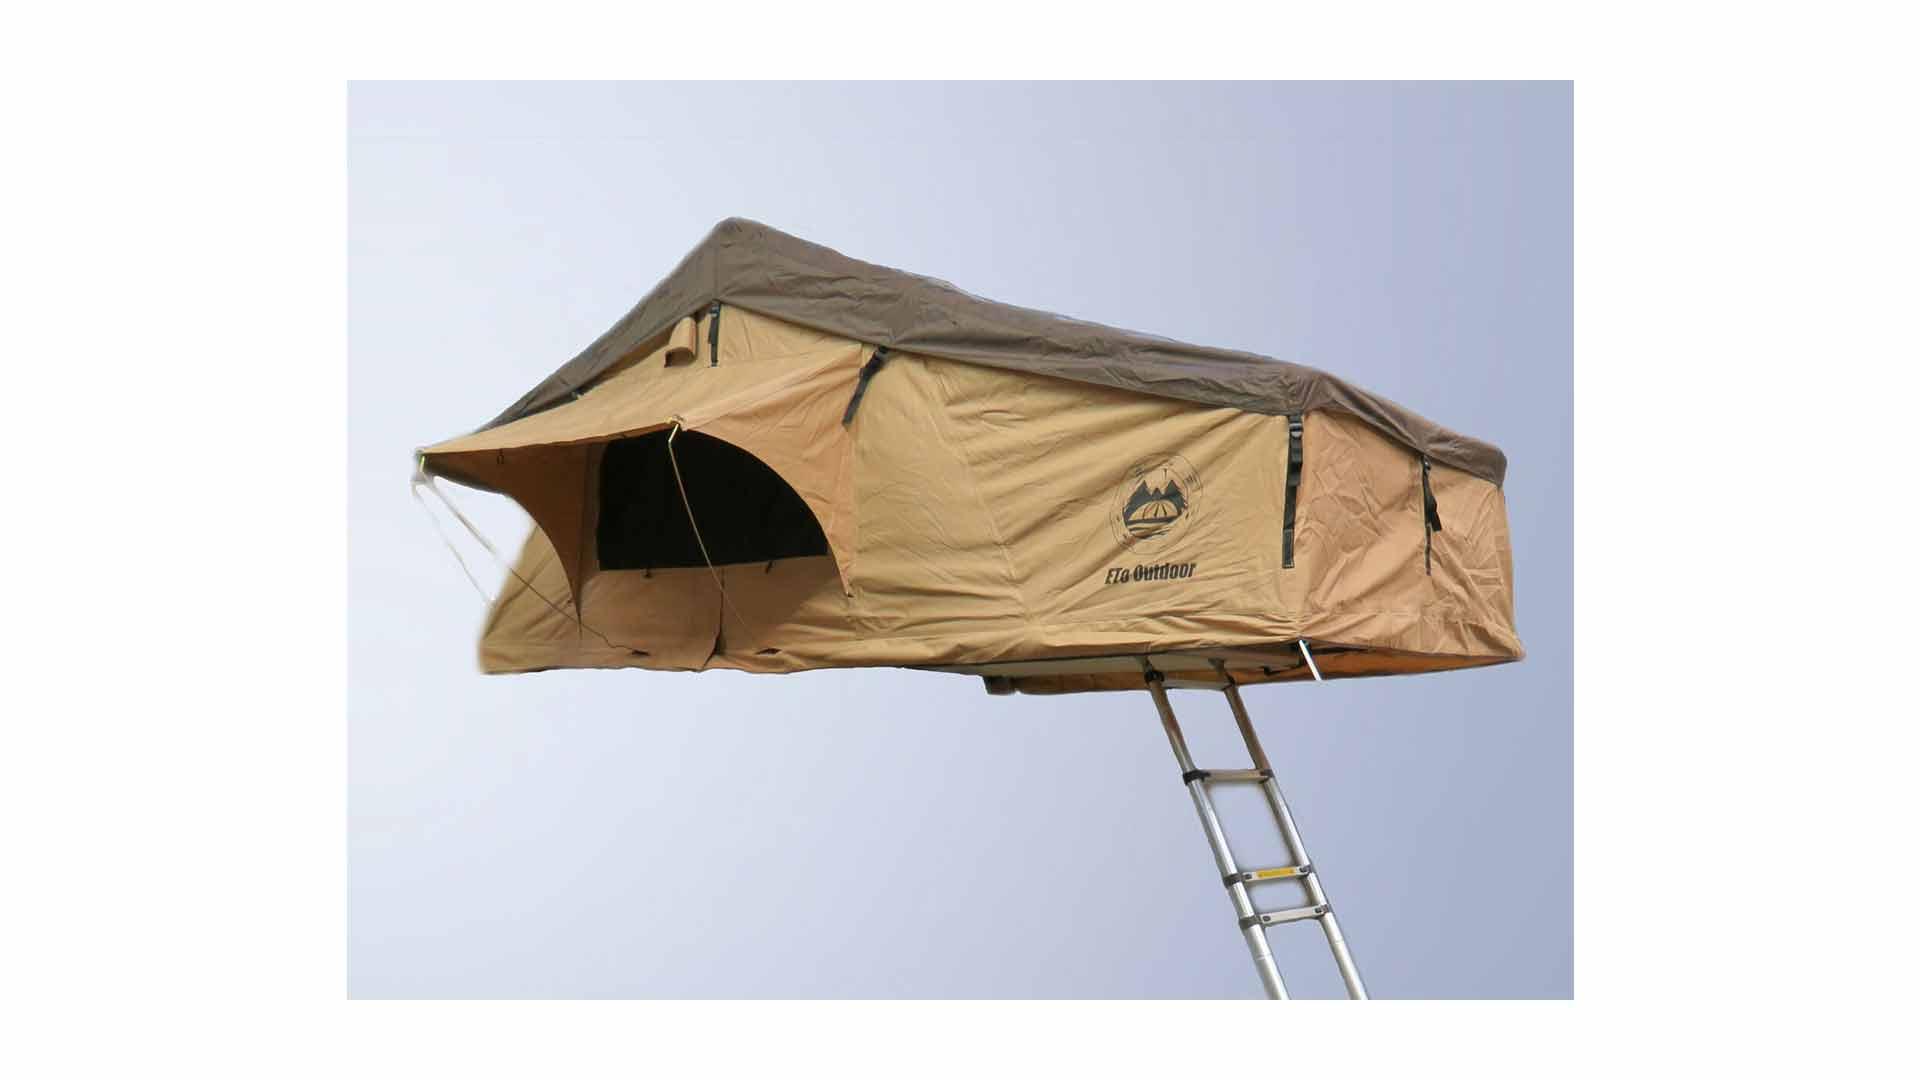 eto outdoor roof tent srt.be-163